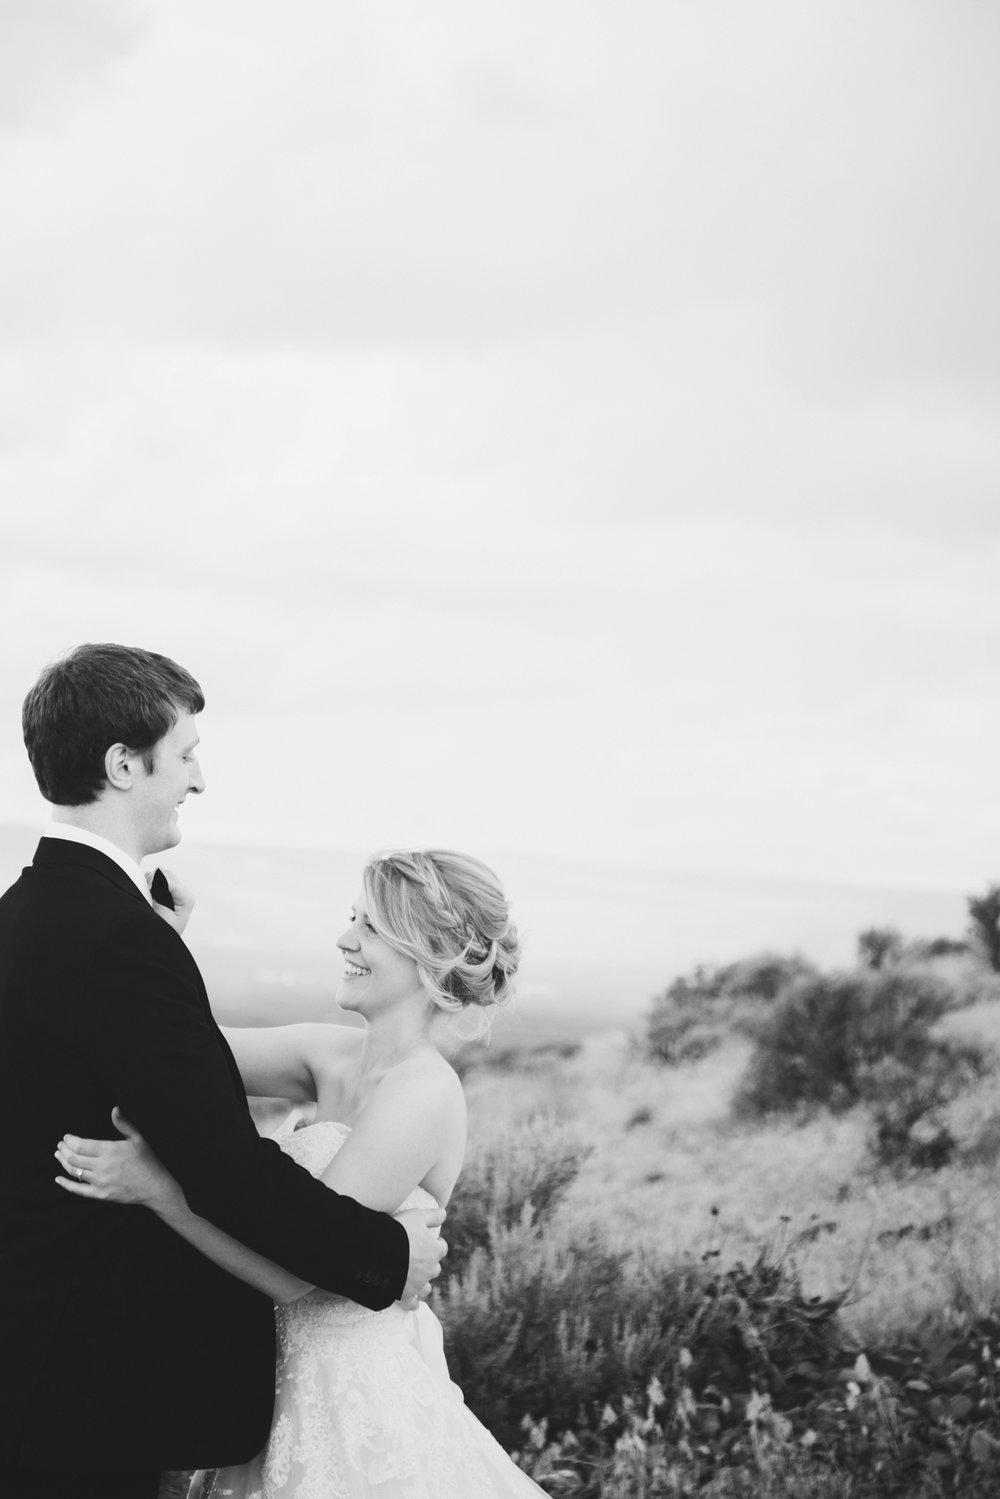 Jordan Edens Photography_Wedding Wednesday_Backup your photos_protect your photos_save your photos_tri cities photographer_kennewick photographer_wedding photographer_4